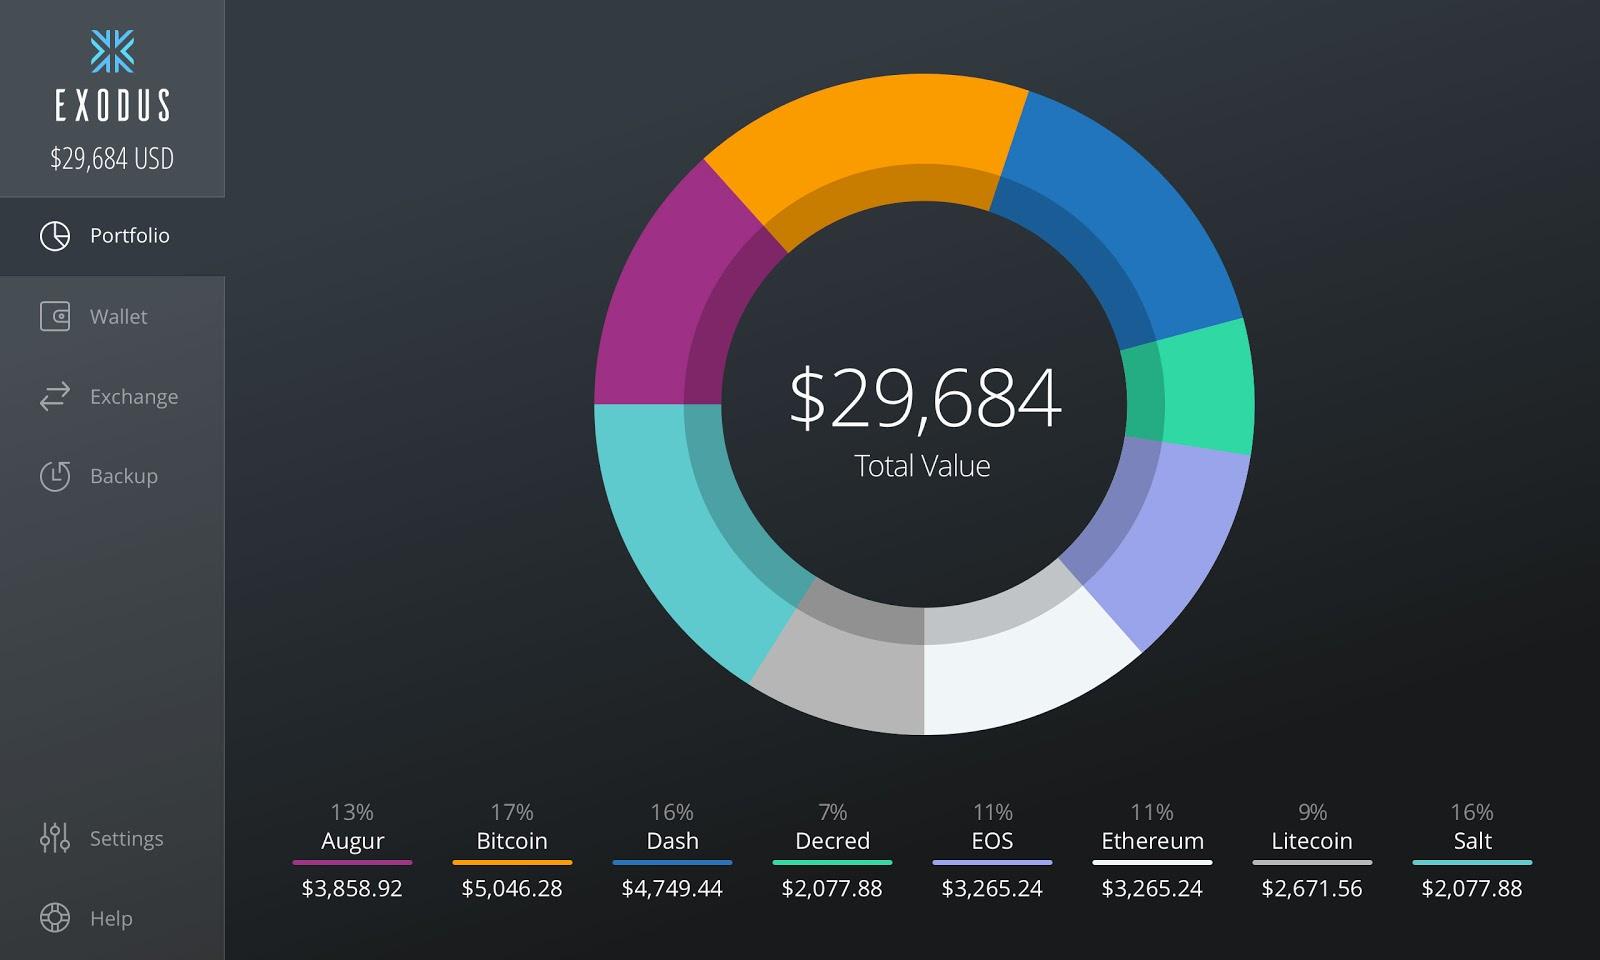 Exodus cryptocurrency wallet